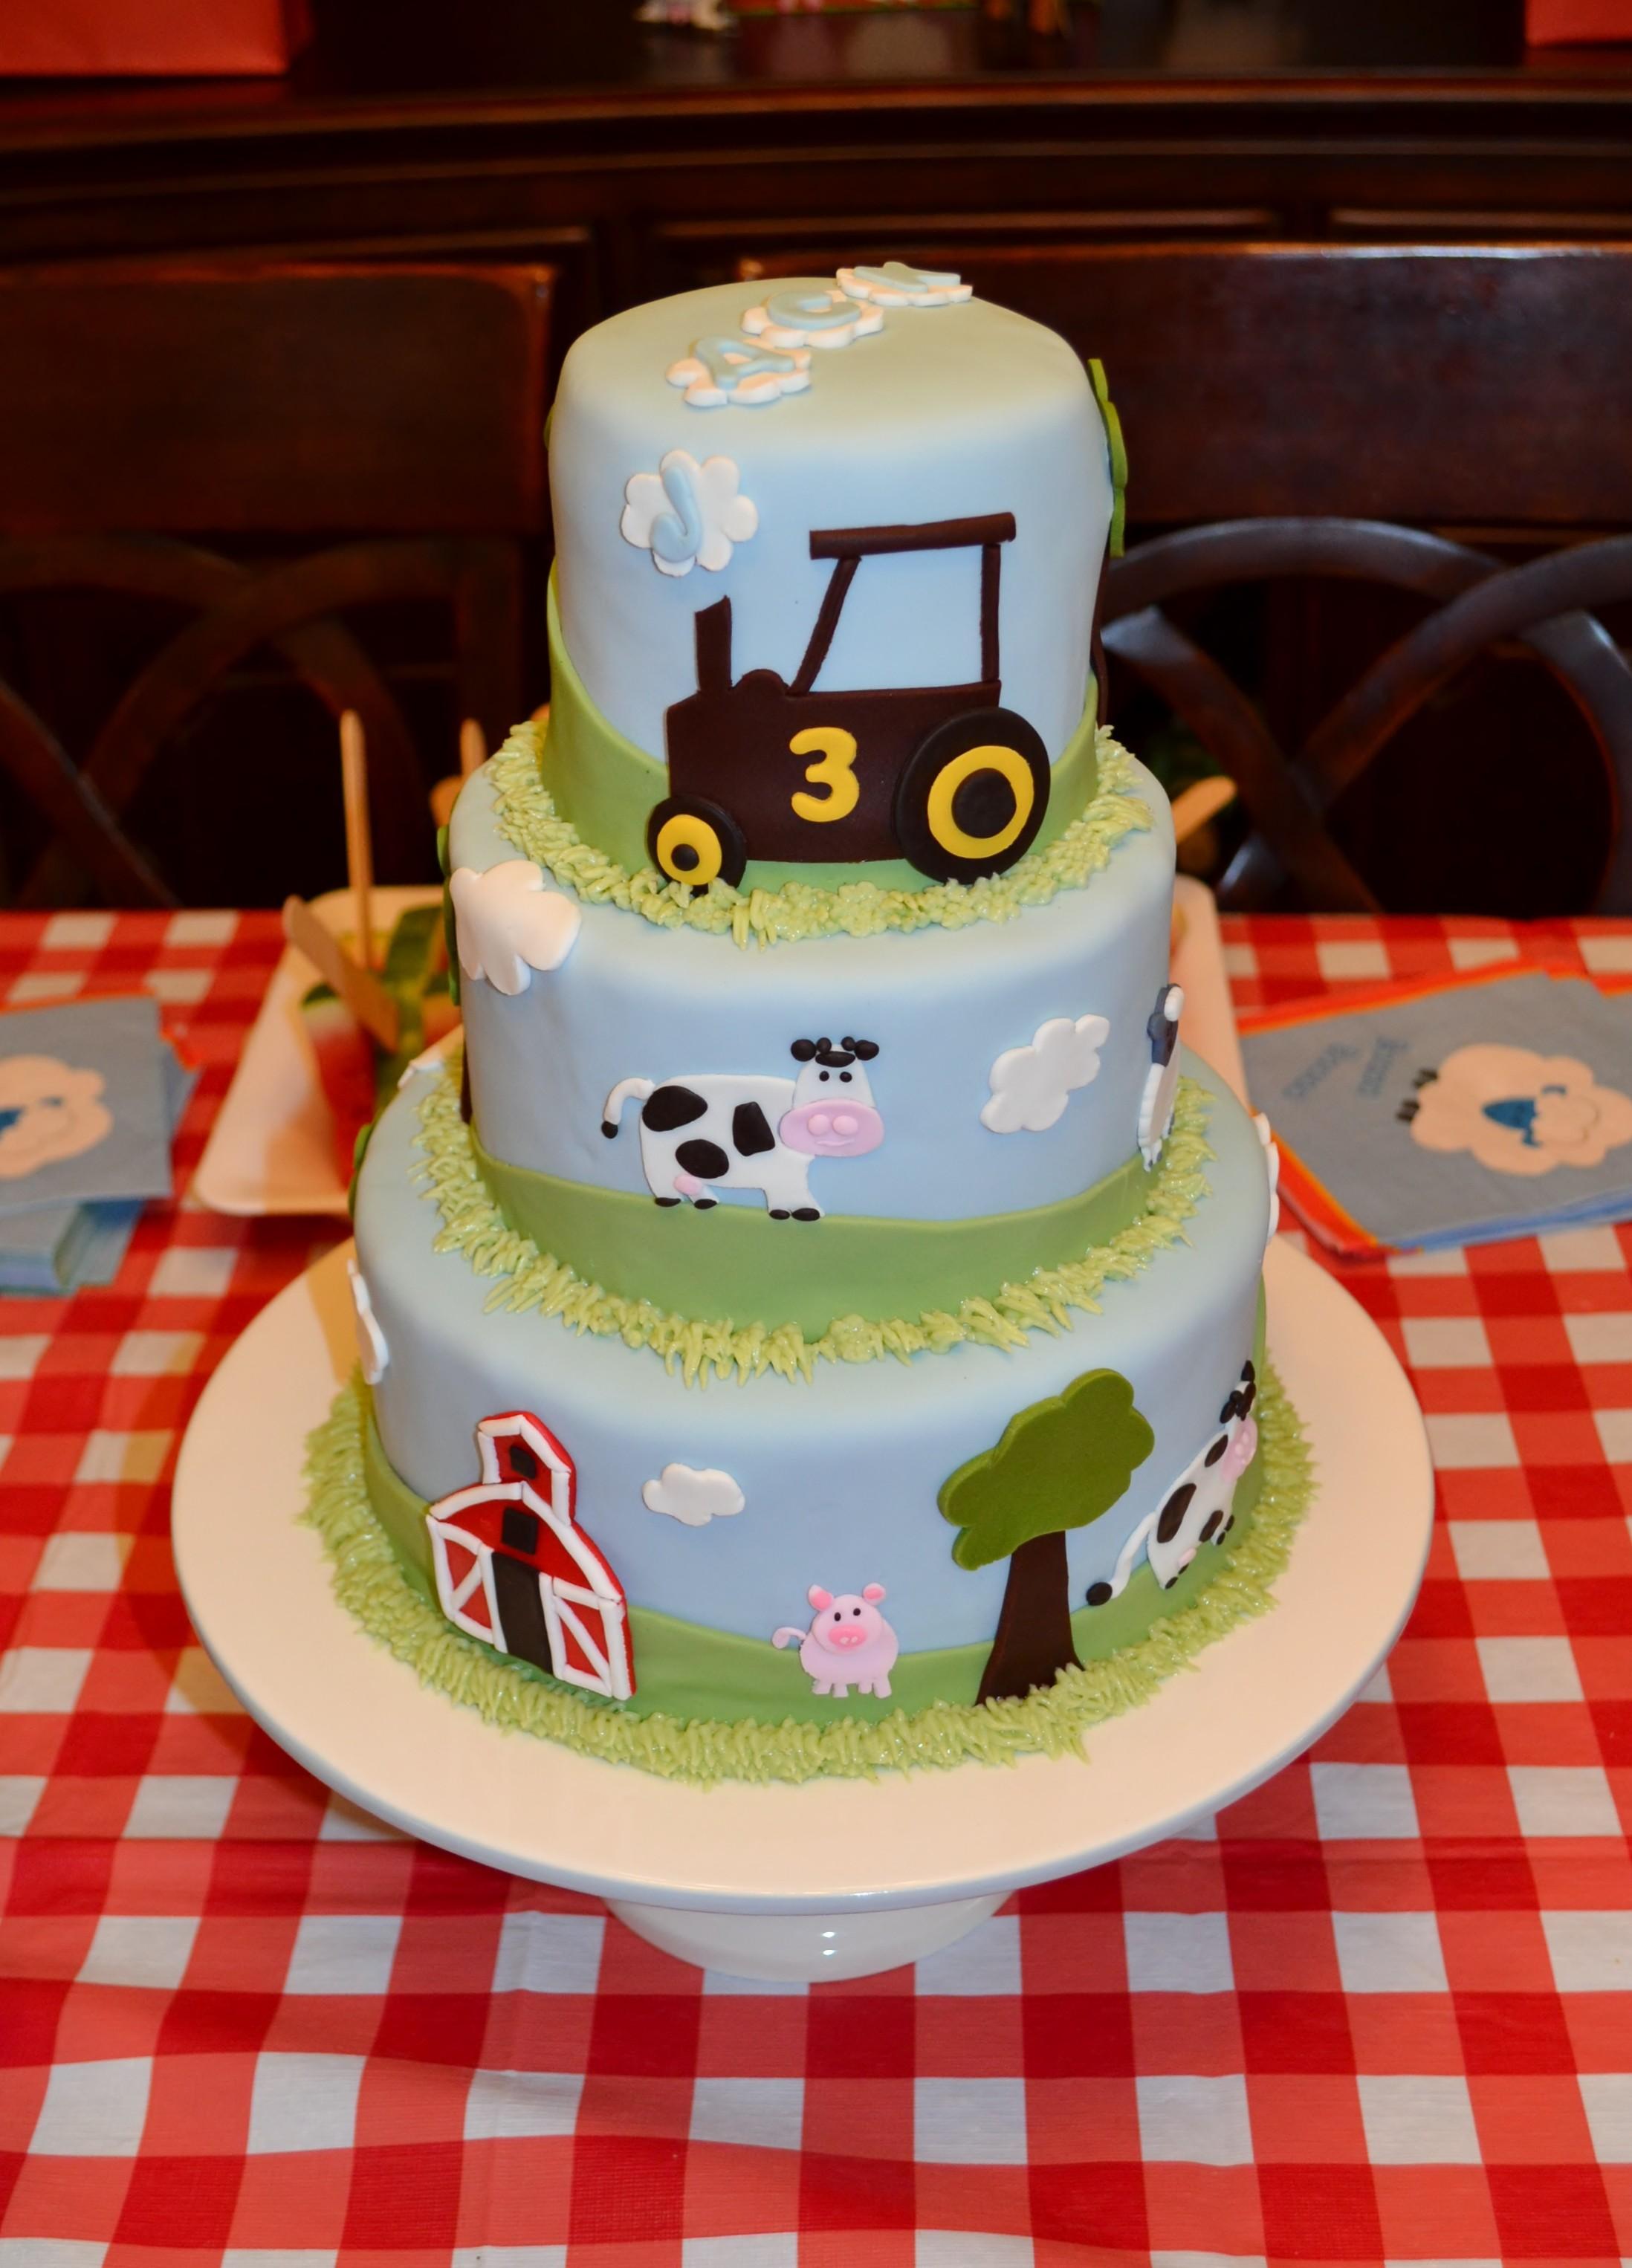 Admirable Barnyard Birthday Party Funny Birthday Cards Online Inifodamsfinfo